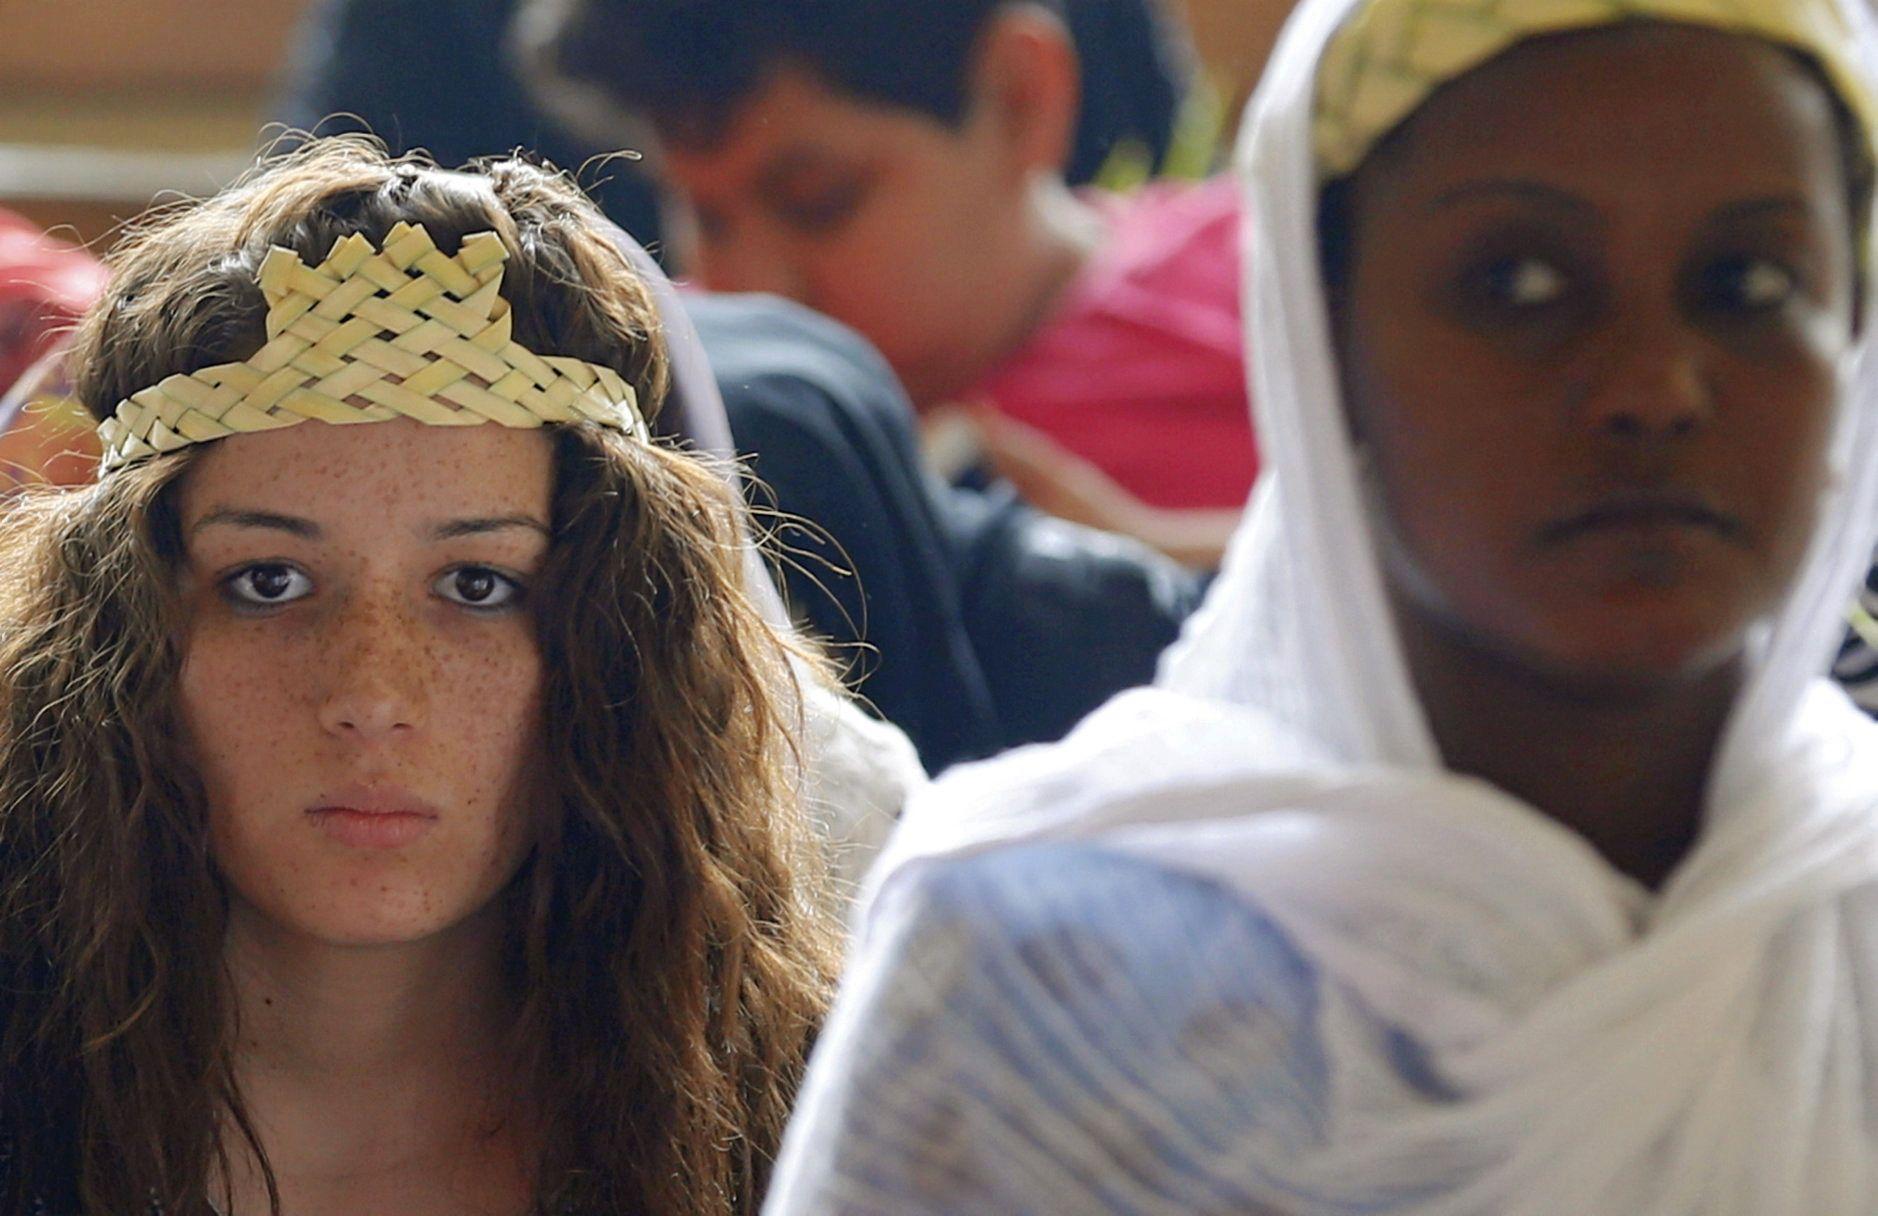 Muslim Beautiful Girl Wallpaper How Egyptian Muslims Are Persecuting Coptic Christians